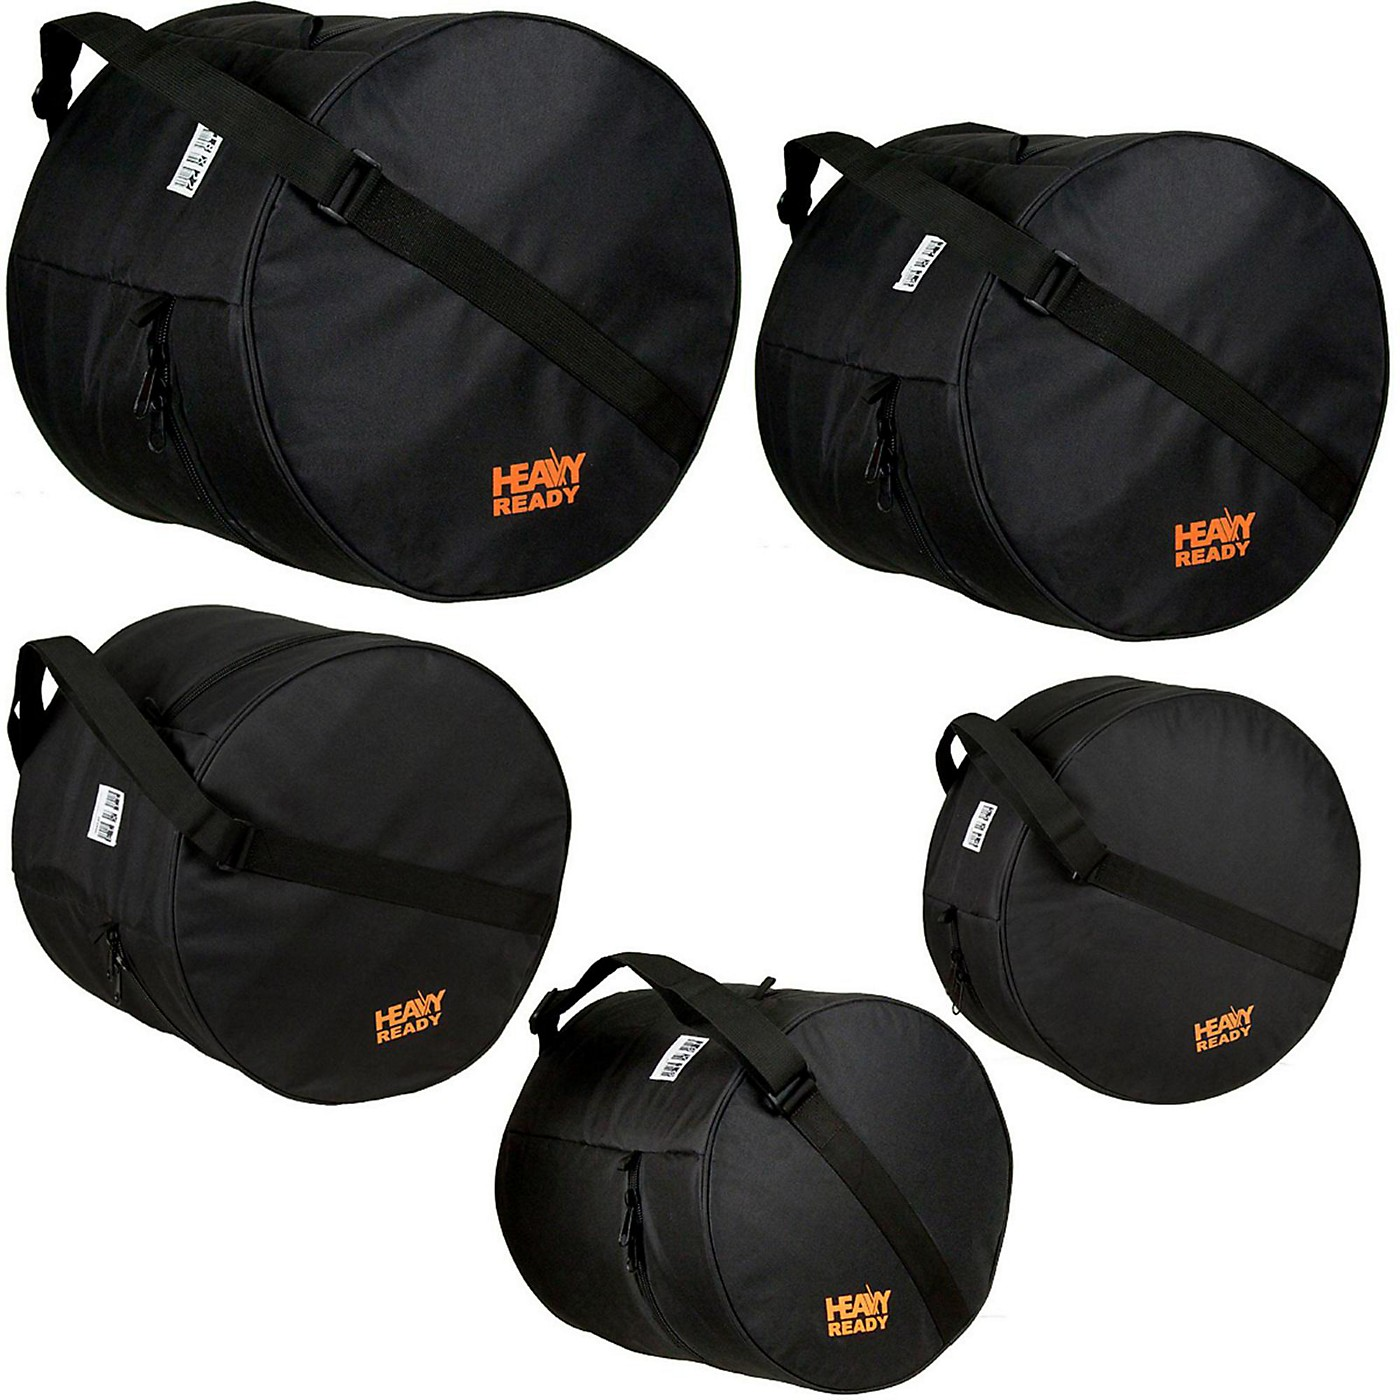 Protec Heavy Ready Series - Drum Bag Set/Fusion thumbnail